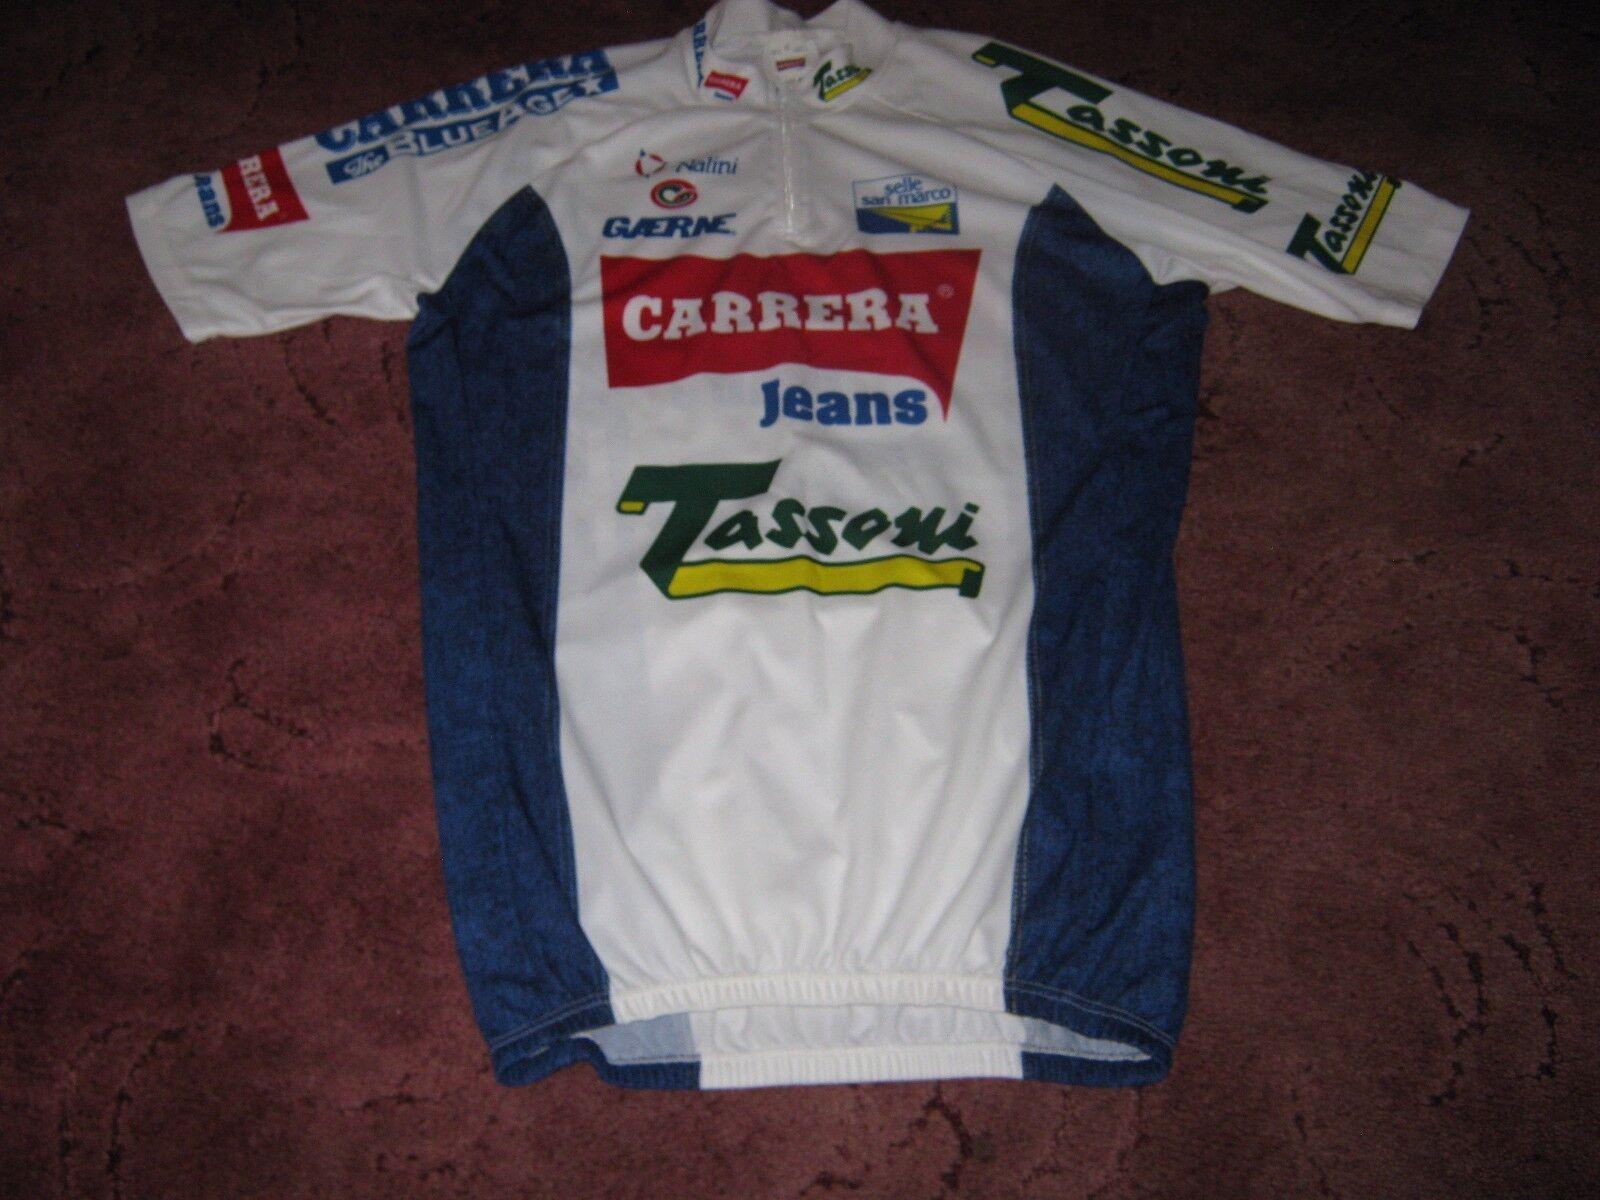 autoRERA TASSONI GAERNE 1993 NALINI italiano vintage ciclismo Jersey [6]